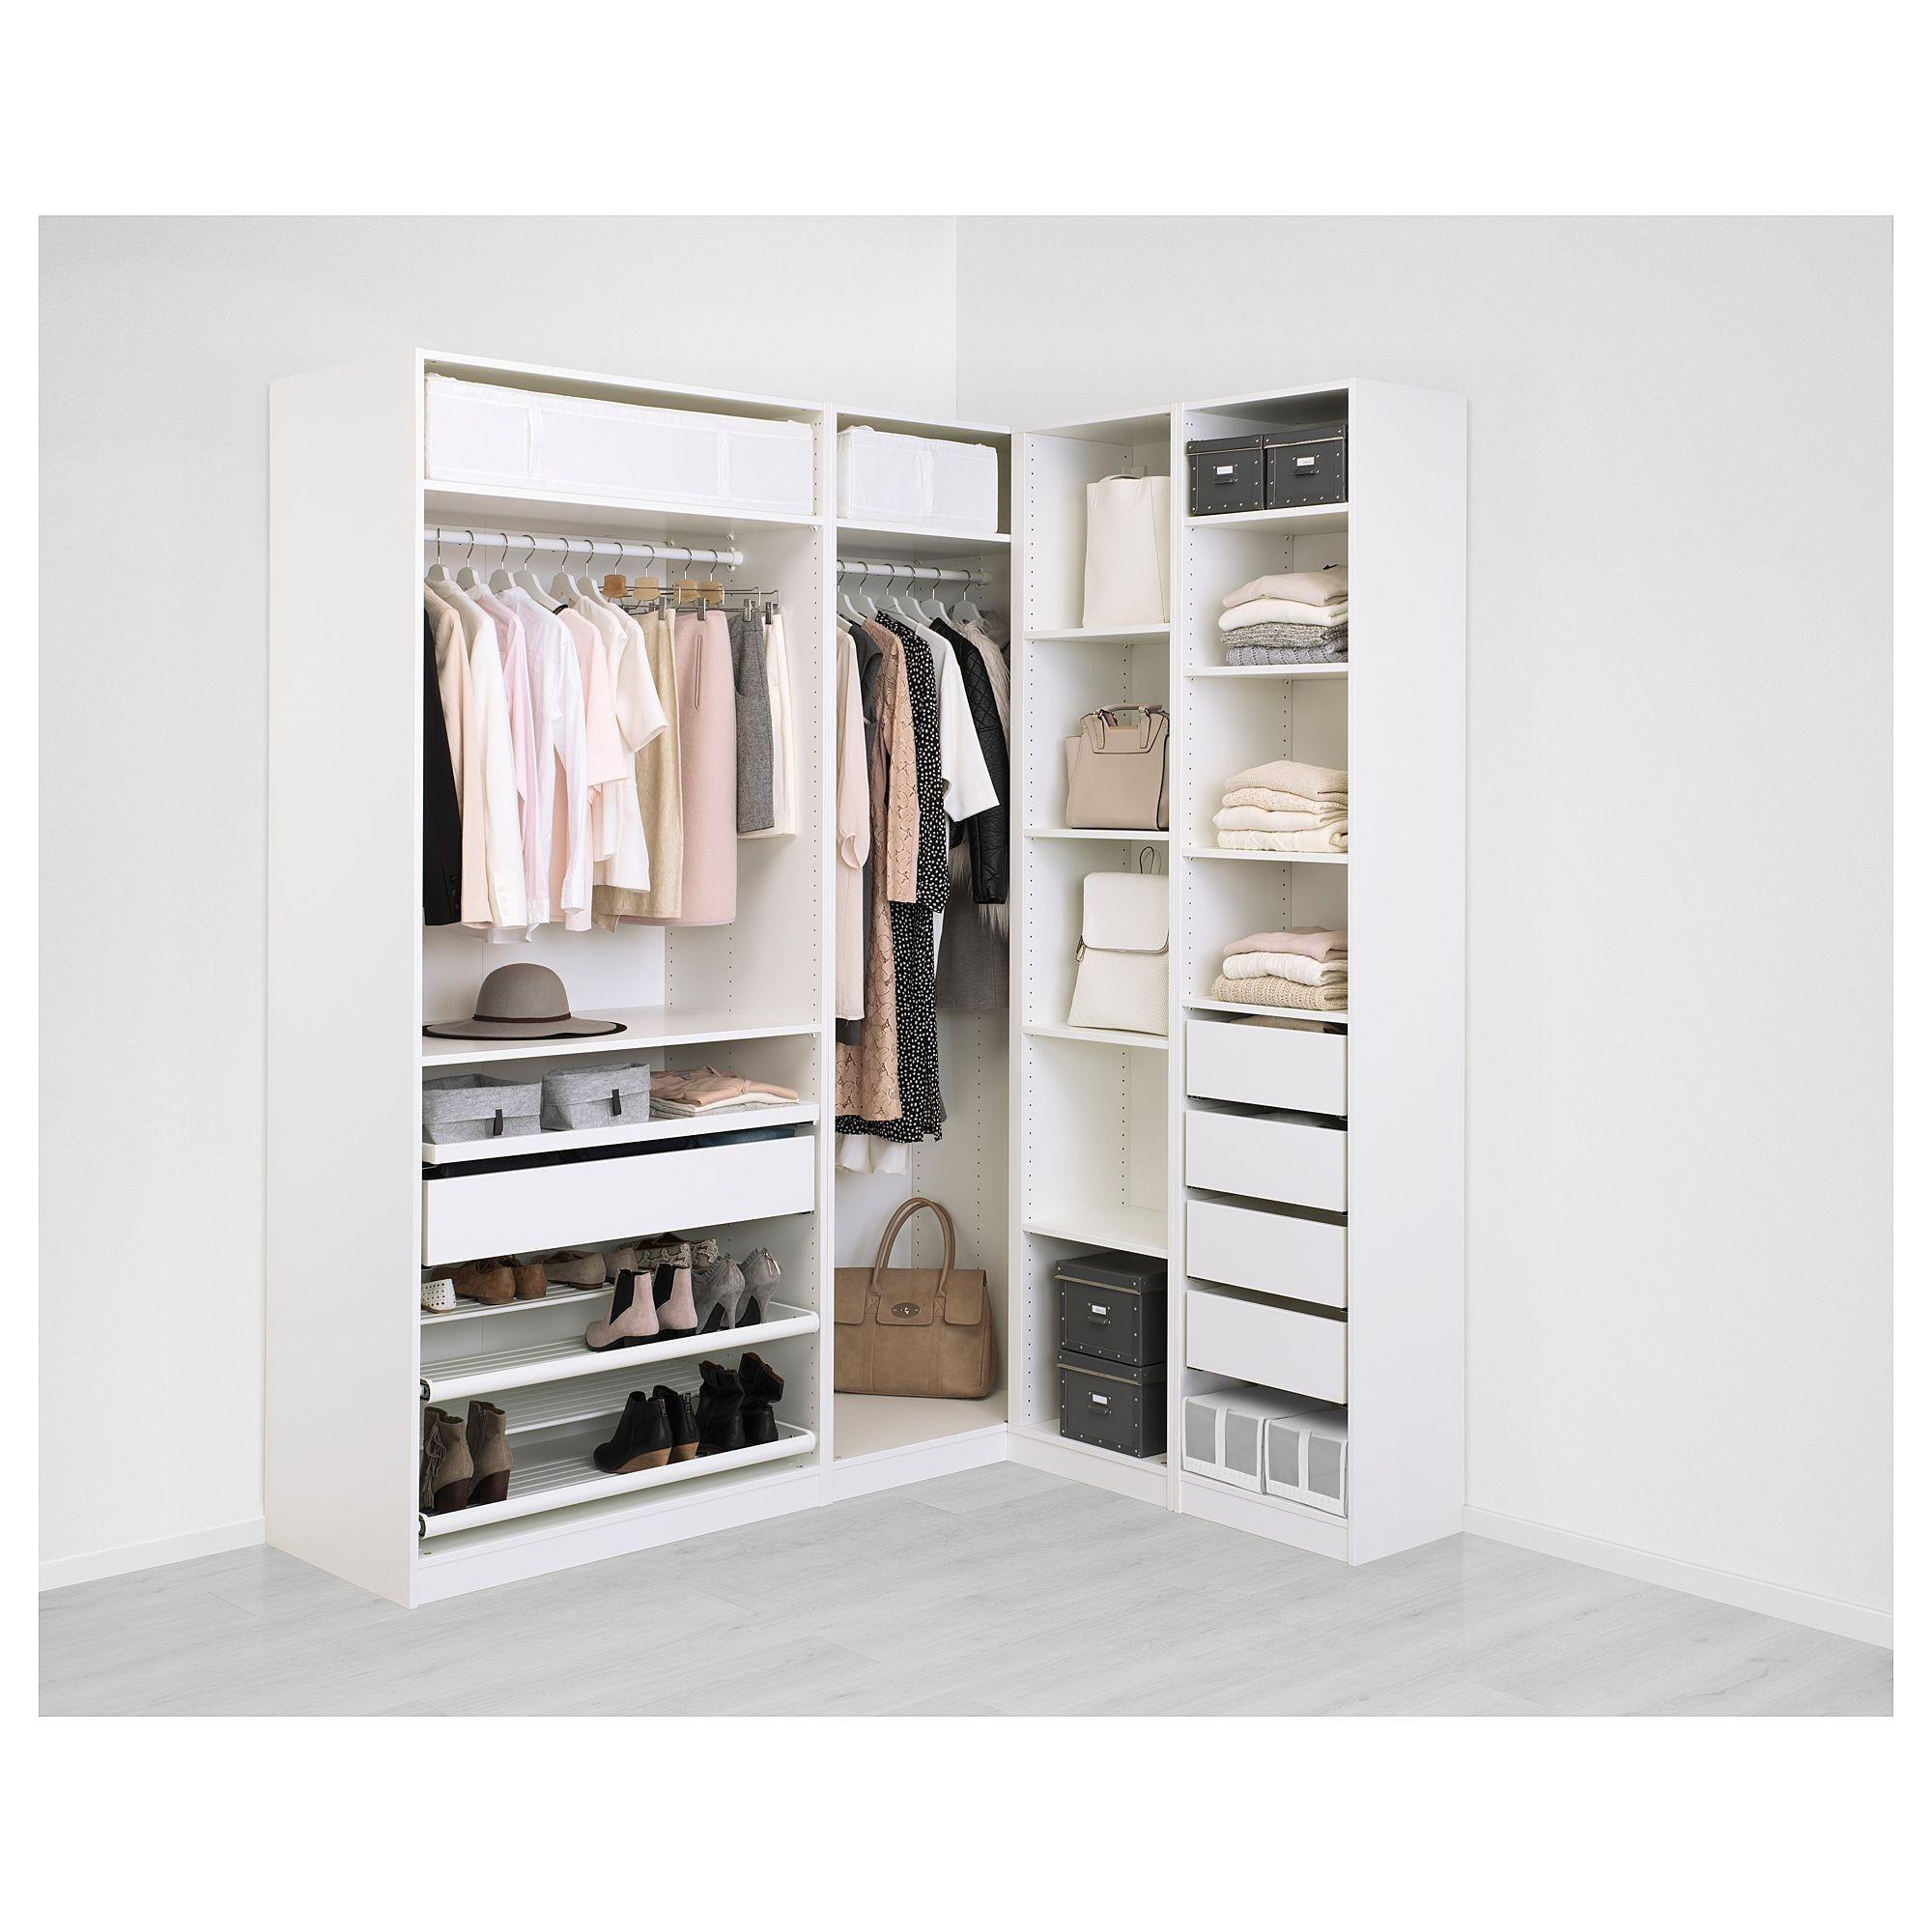 Ikea Placard Sur Mesure luxury ikea placard sur mesure | armoire penderie, dressing